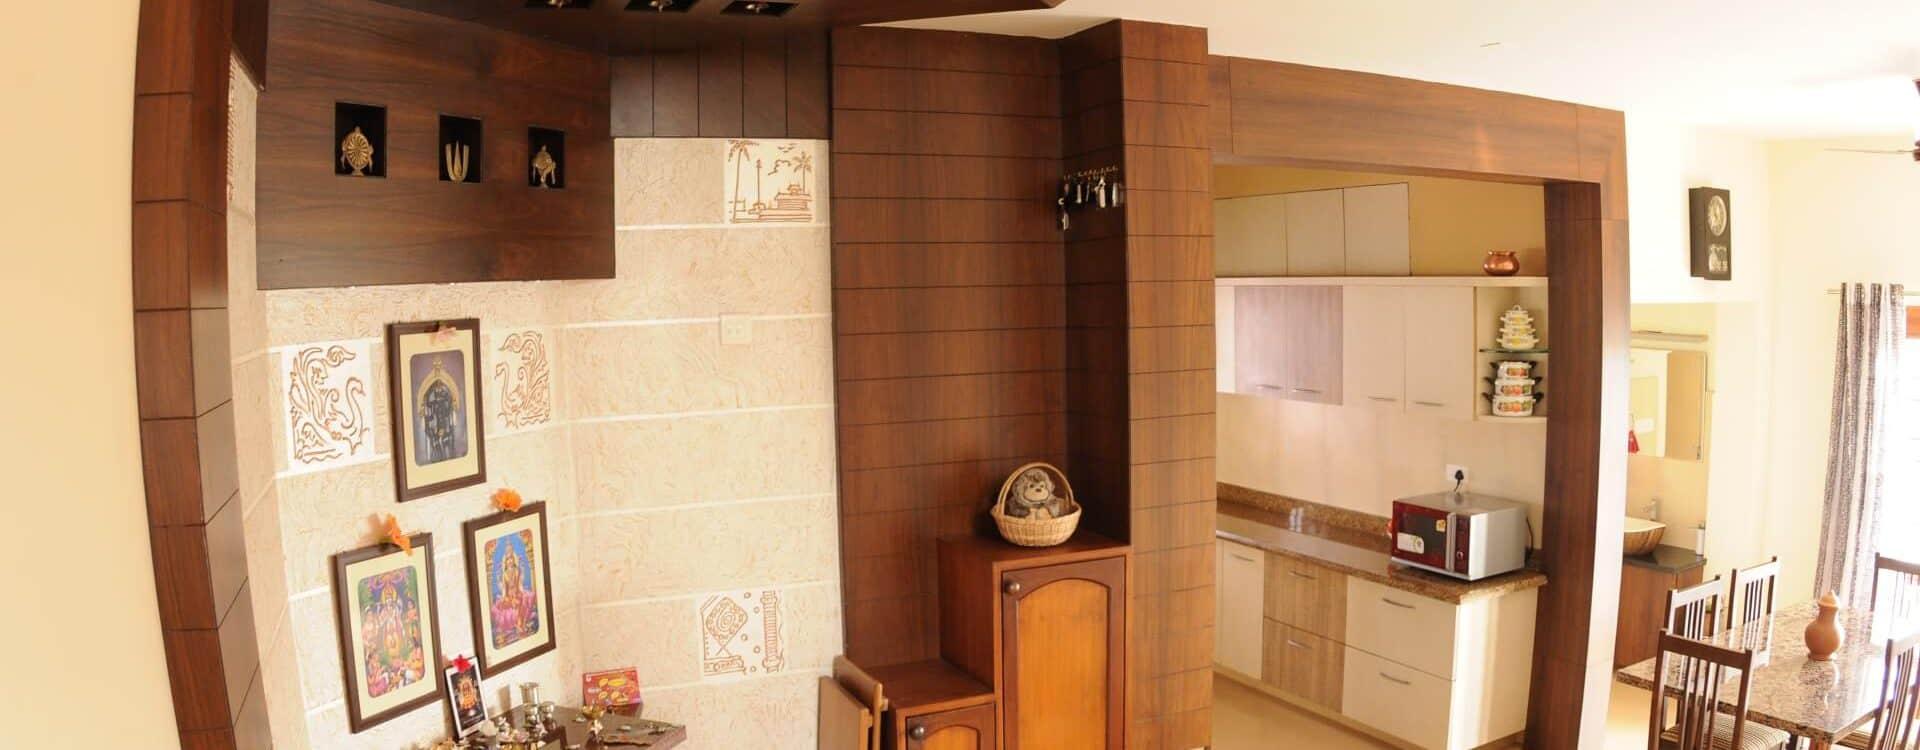 Mr. Varadraj Jogi's Residence at Padavinangadi, Mangalore